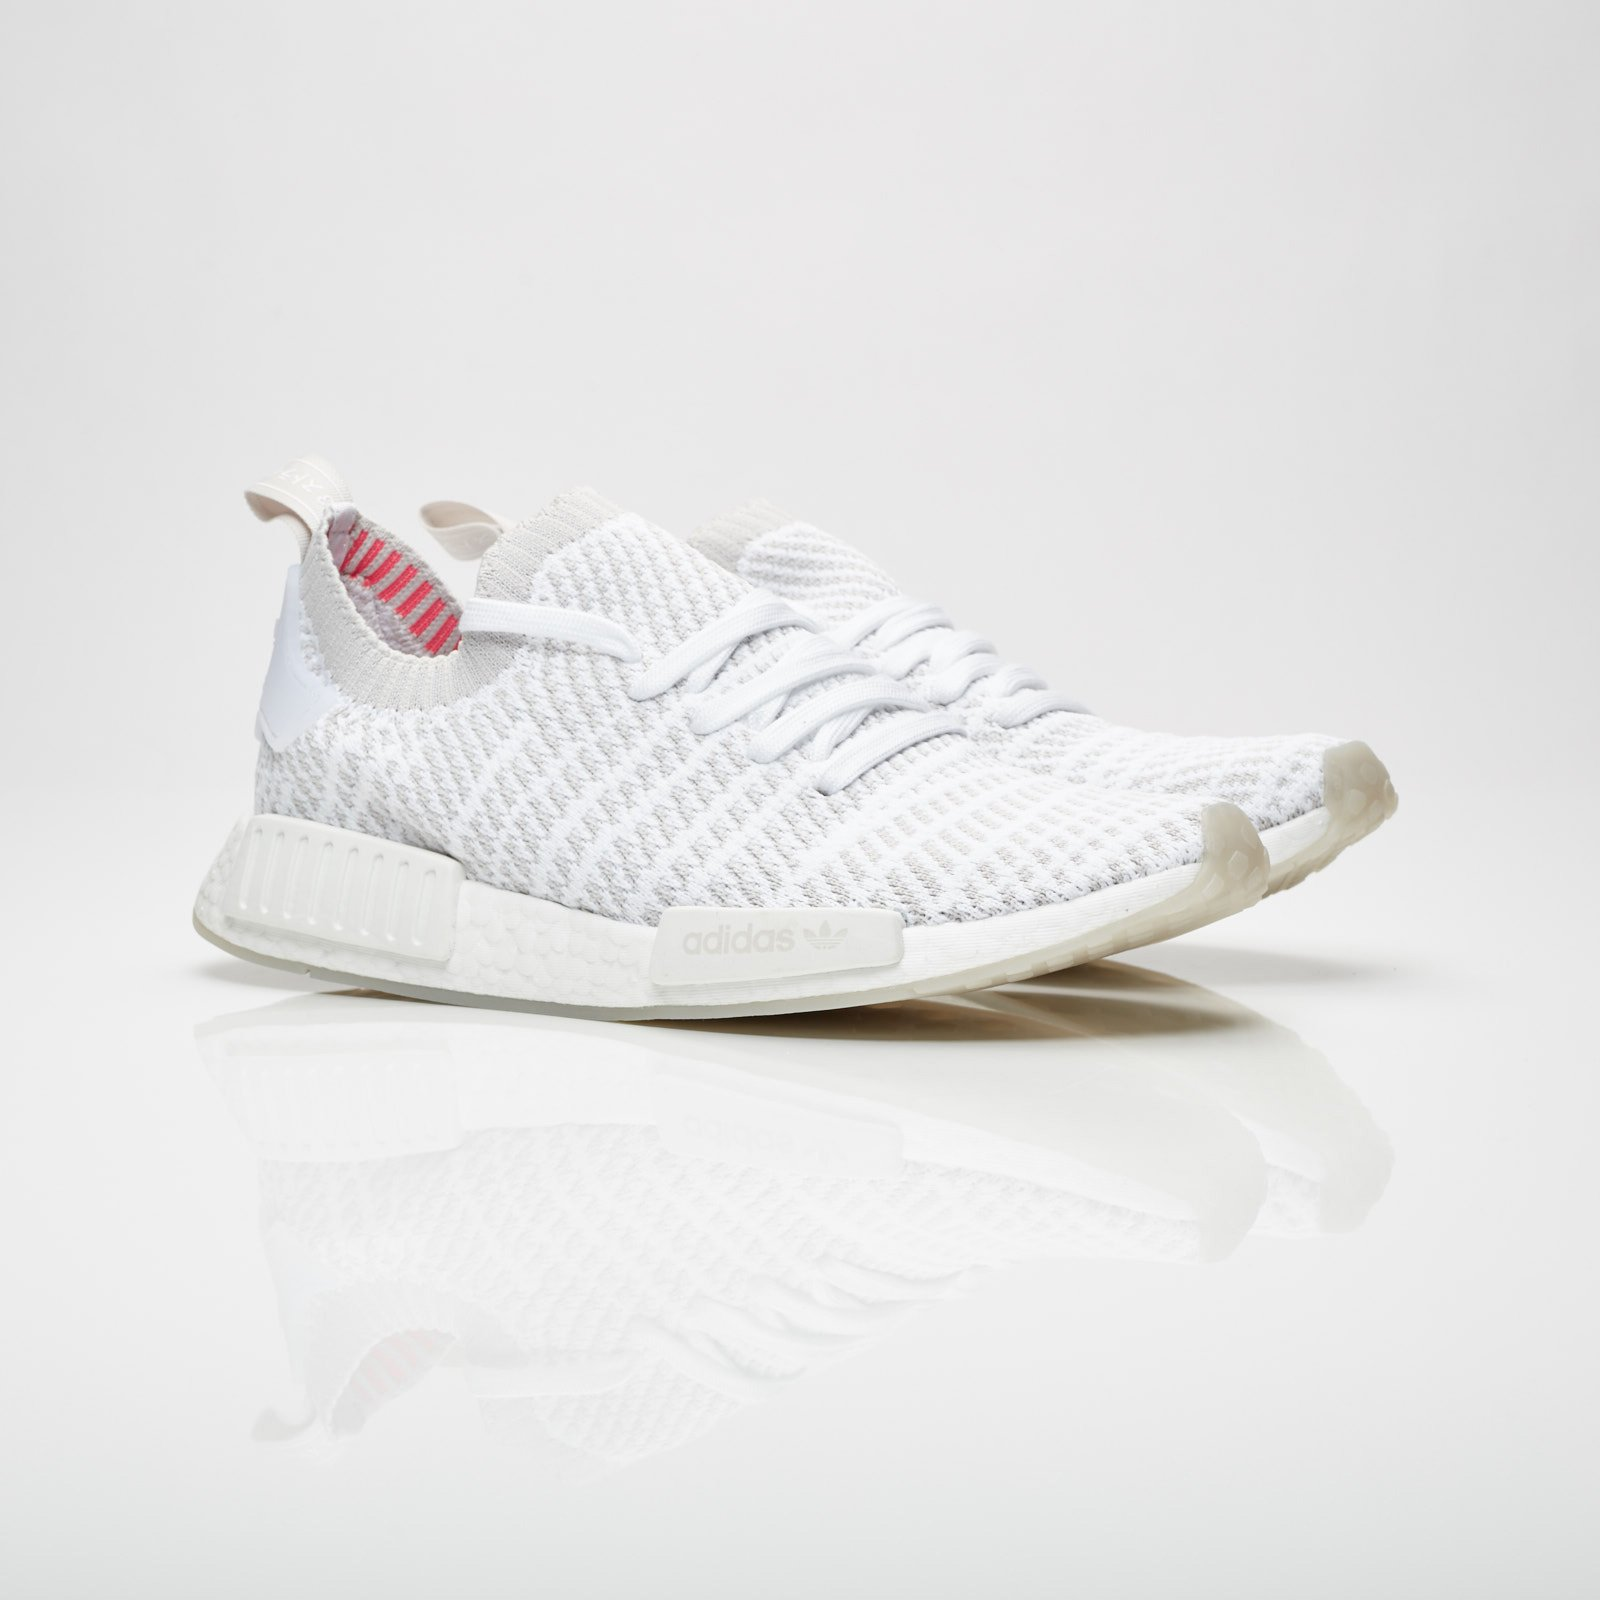 fdf65efa223f0 adidas NMD R1 Stlt PK - Cq2390 - Sneakersnstuff